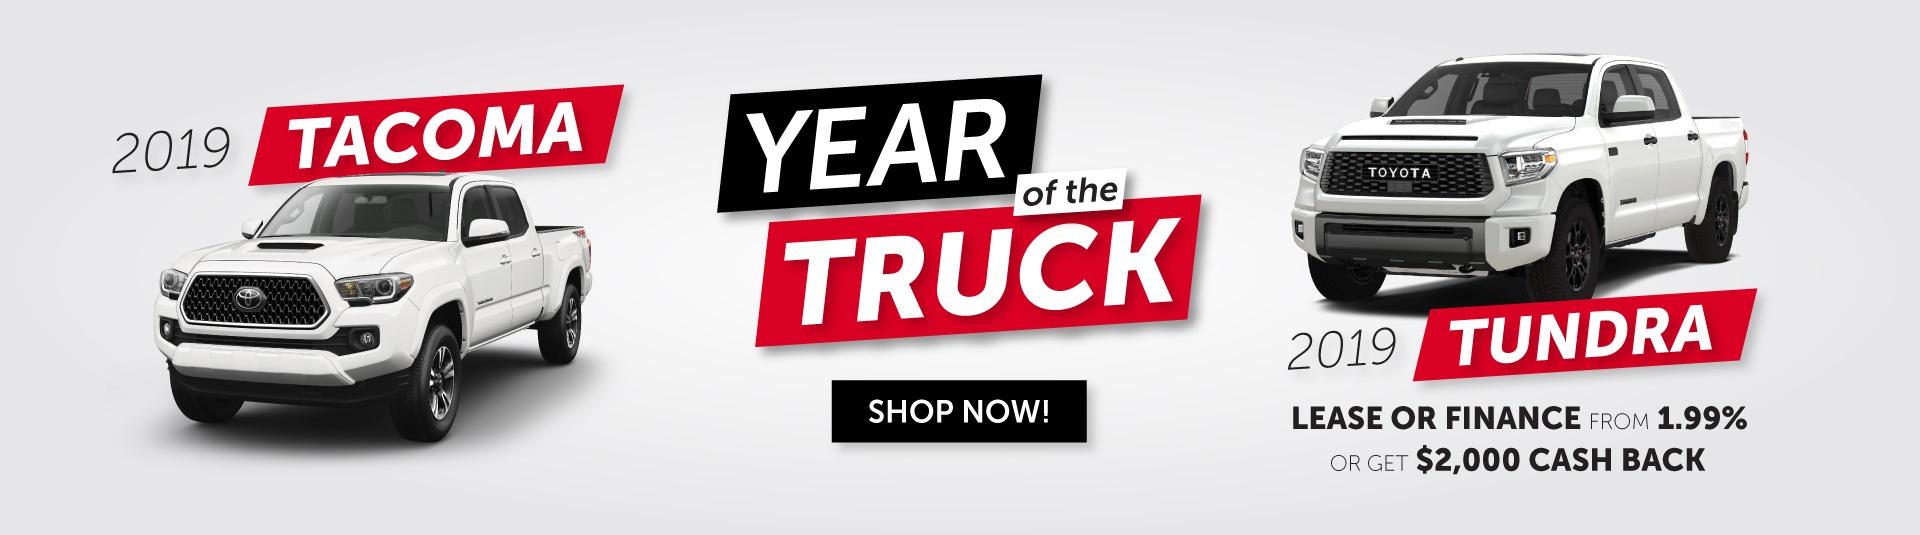 Year of the Truck -Tacoma and Tundra